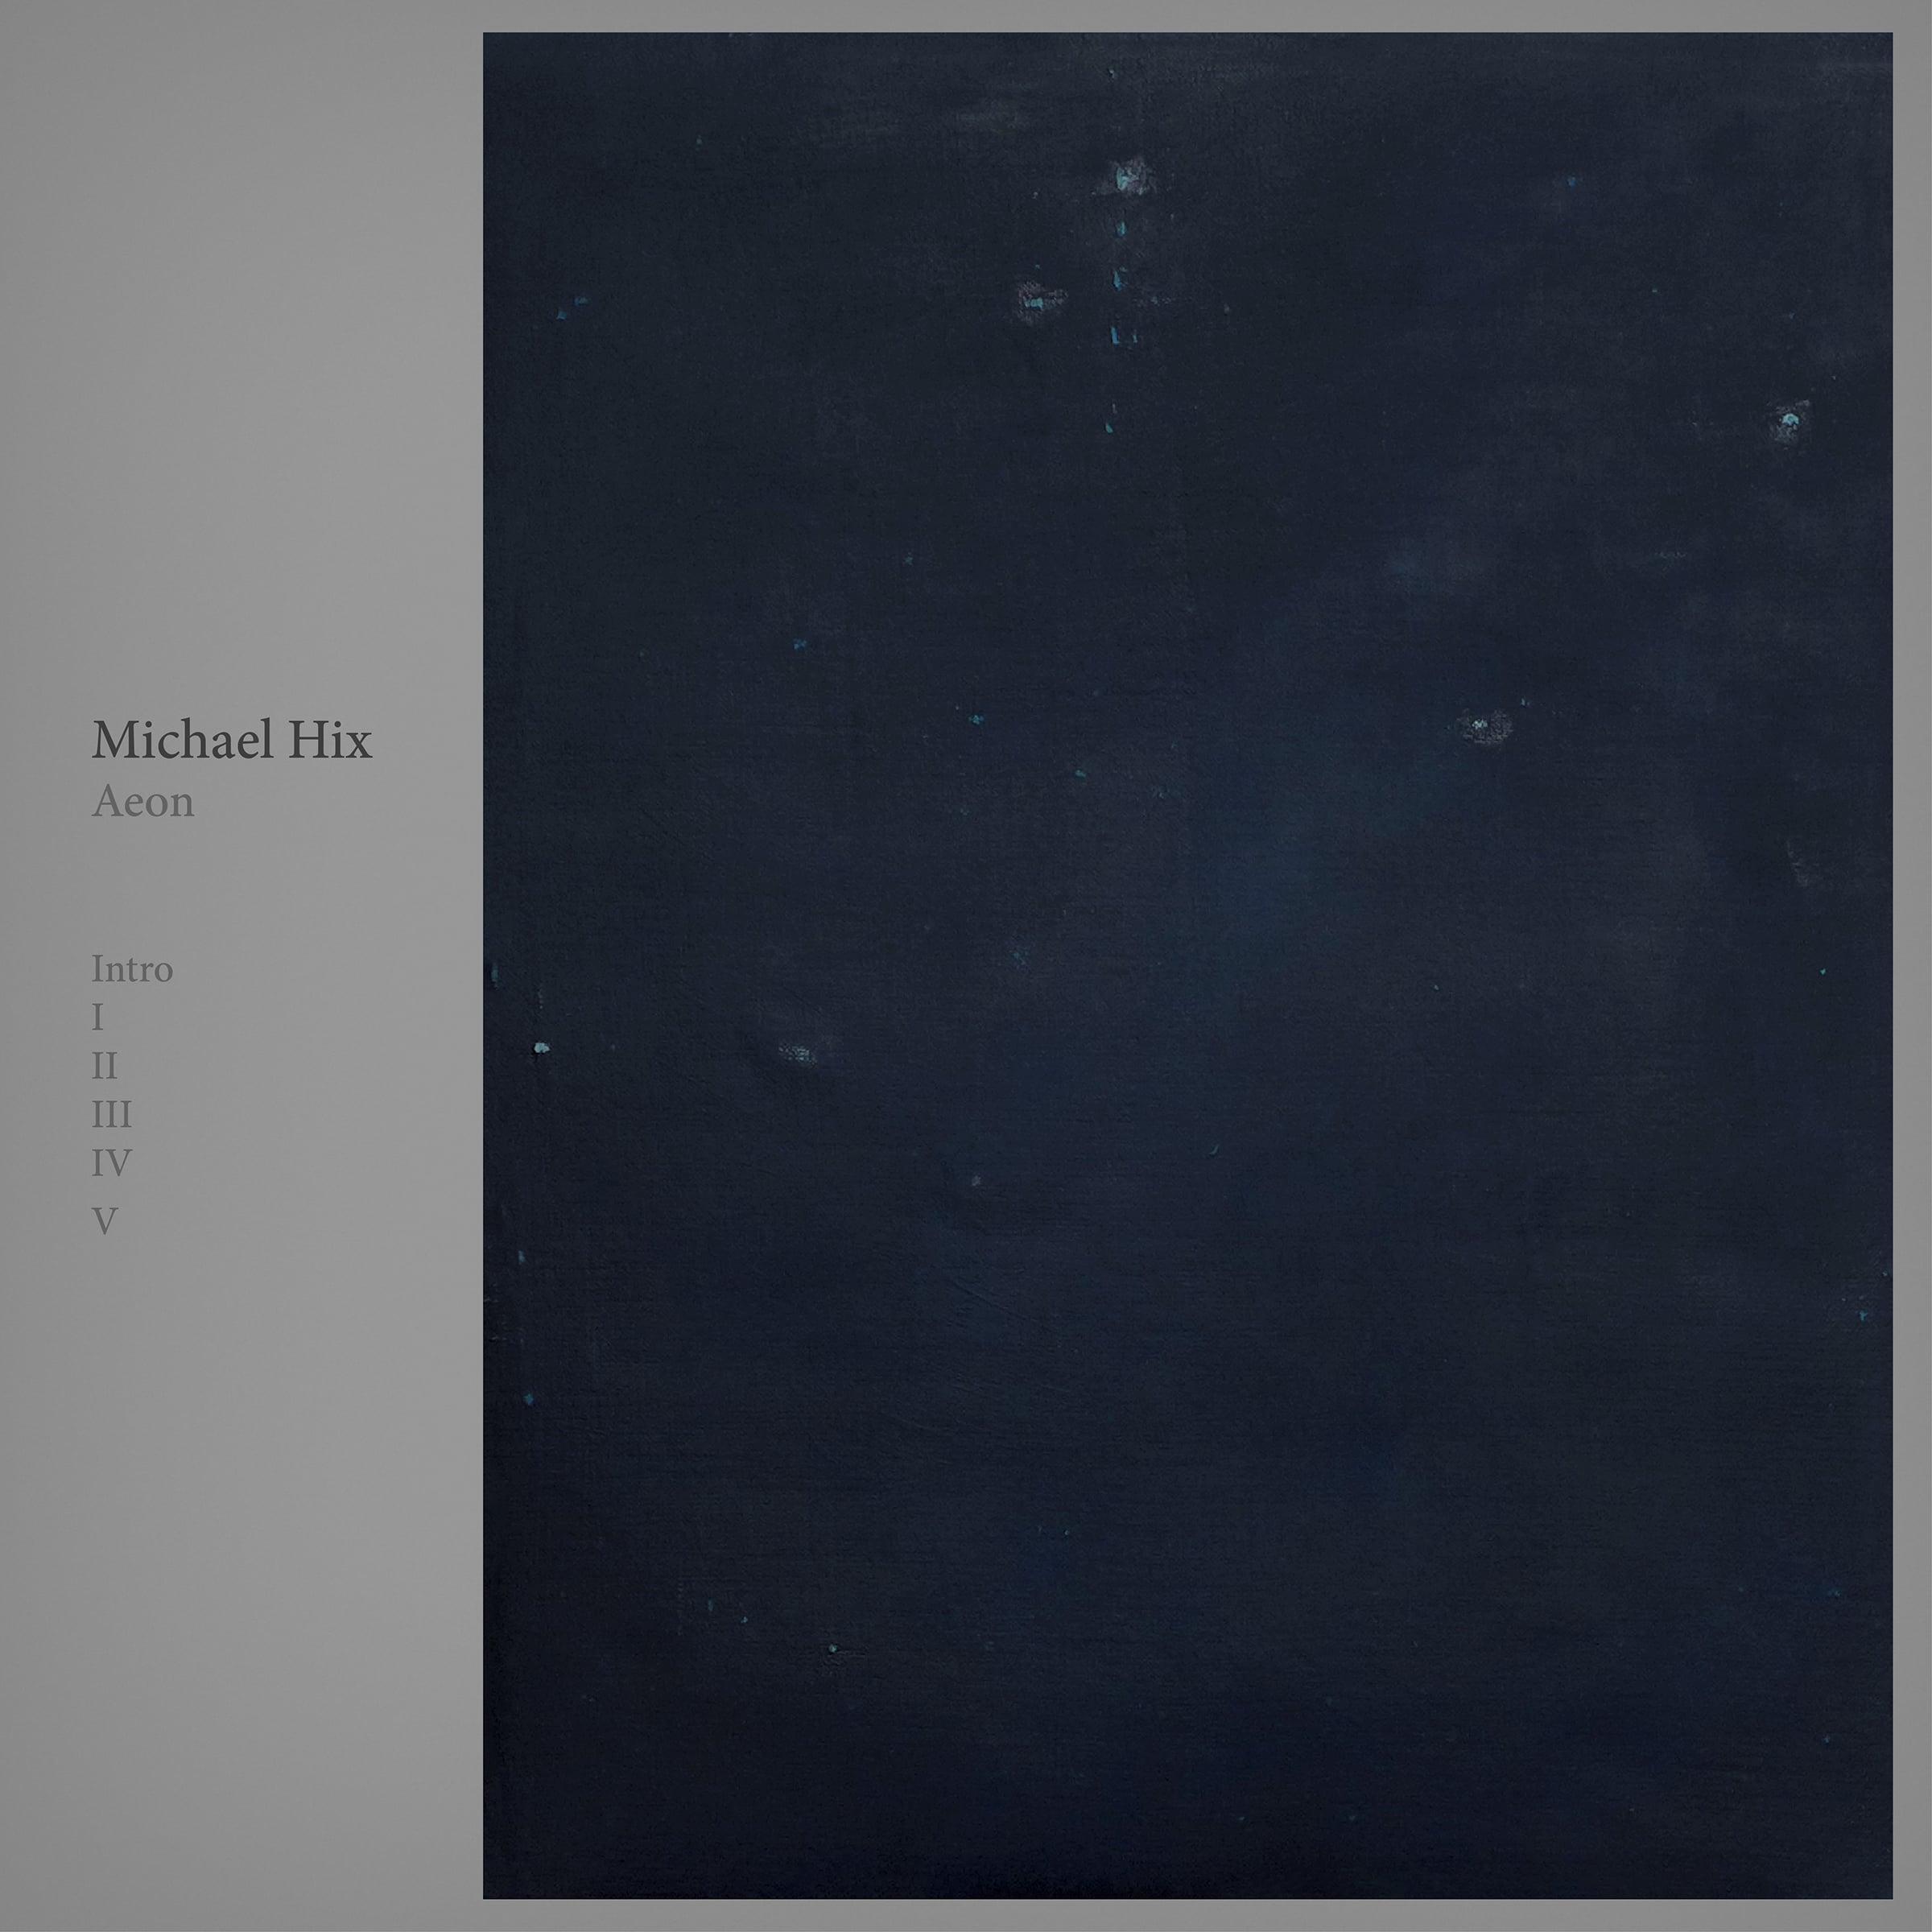 Michael Hix - Aeon